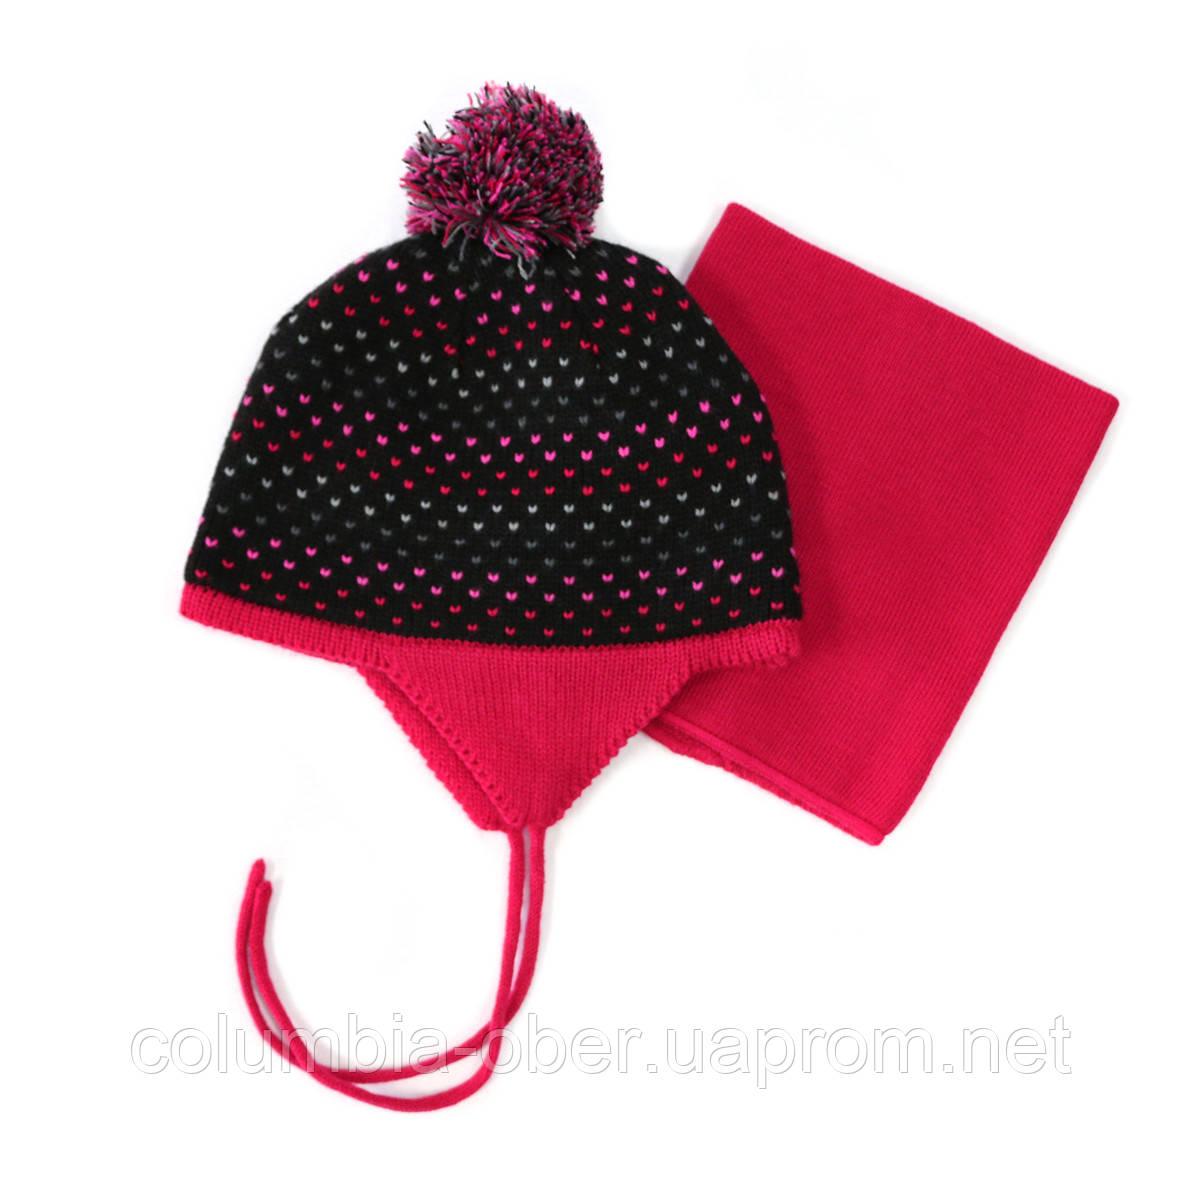 Зимняя шапка+манишка для девочки PELUCHE 58 EF ACC F16 Black. Размер 3/5 и 6/8.